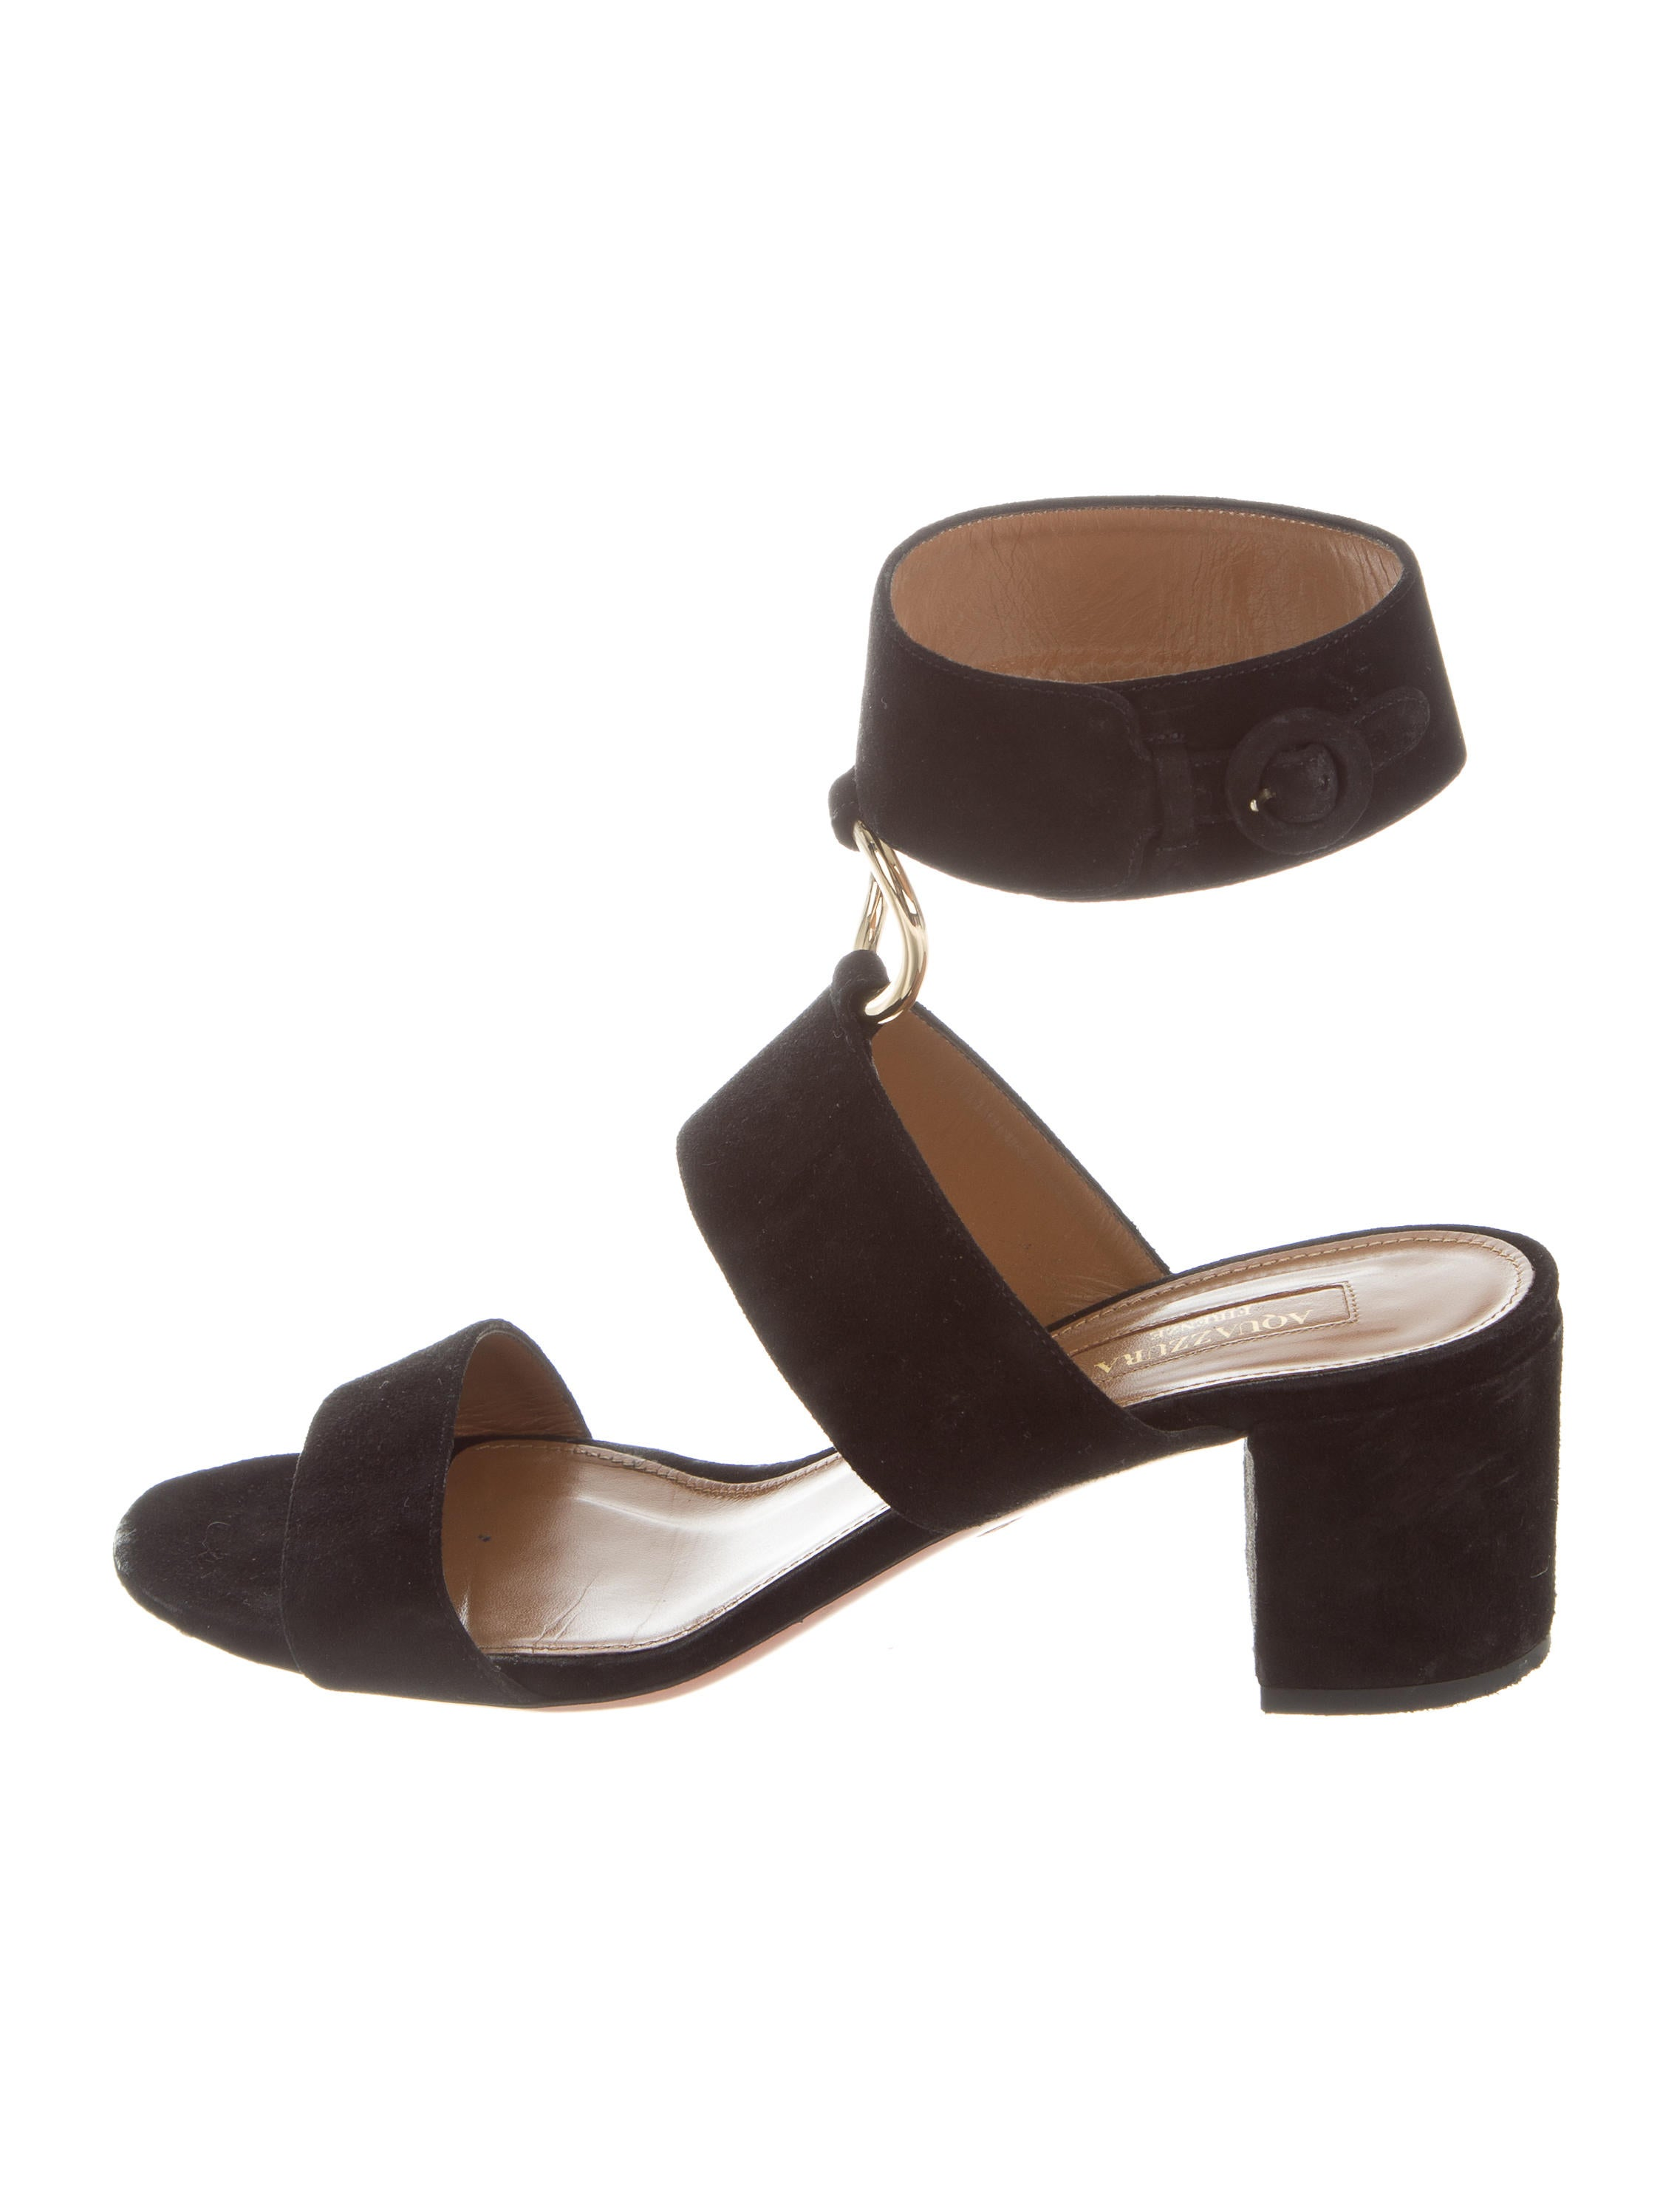 cheap sale great deals Aquazzura Suede Multistrap Sandals cheap real finishline sale discounts 5gjisPWA